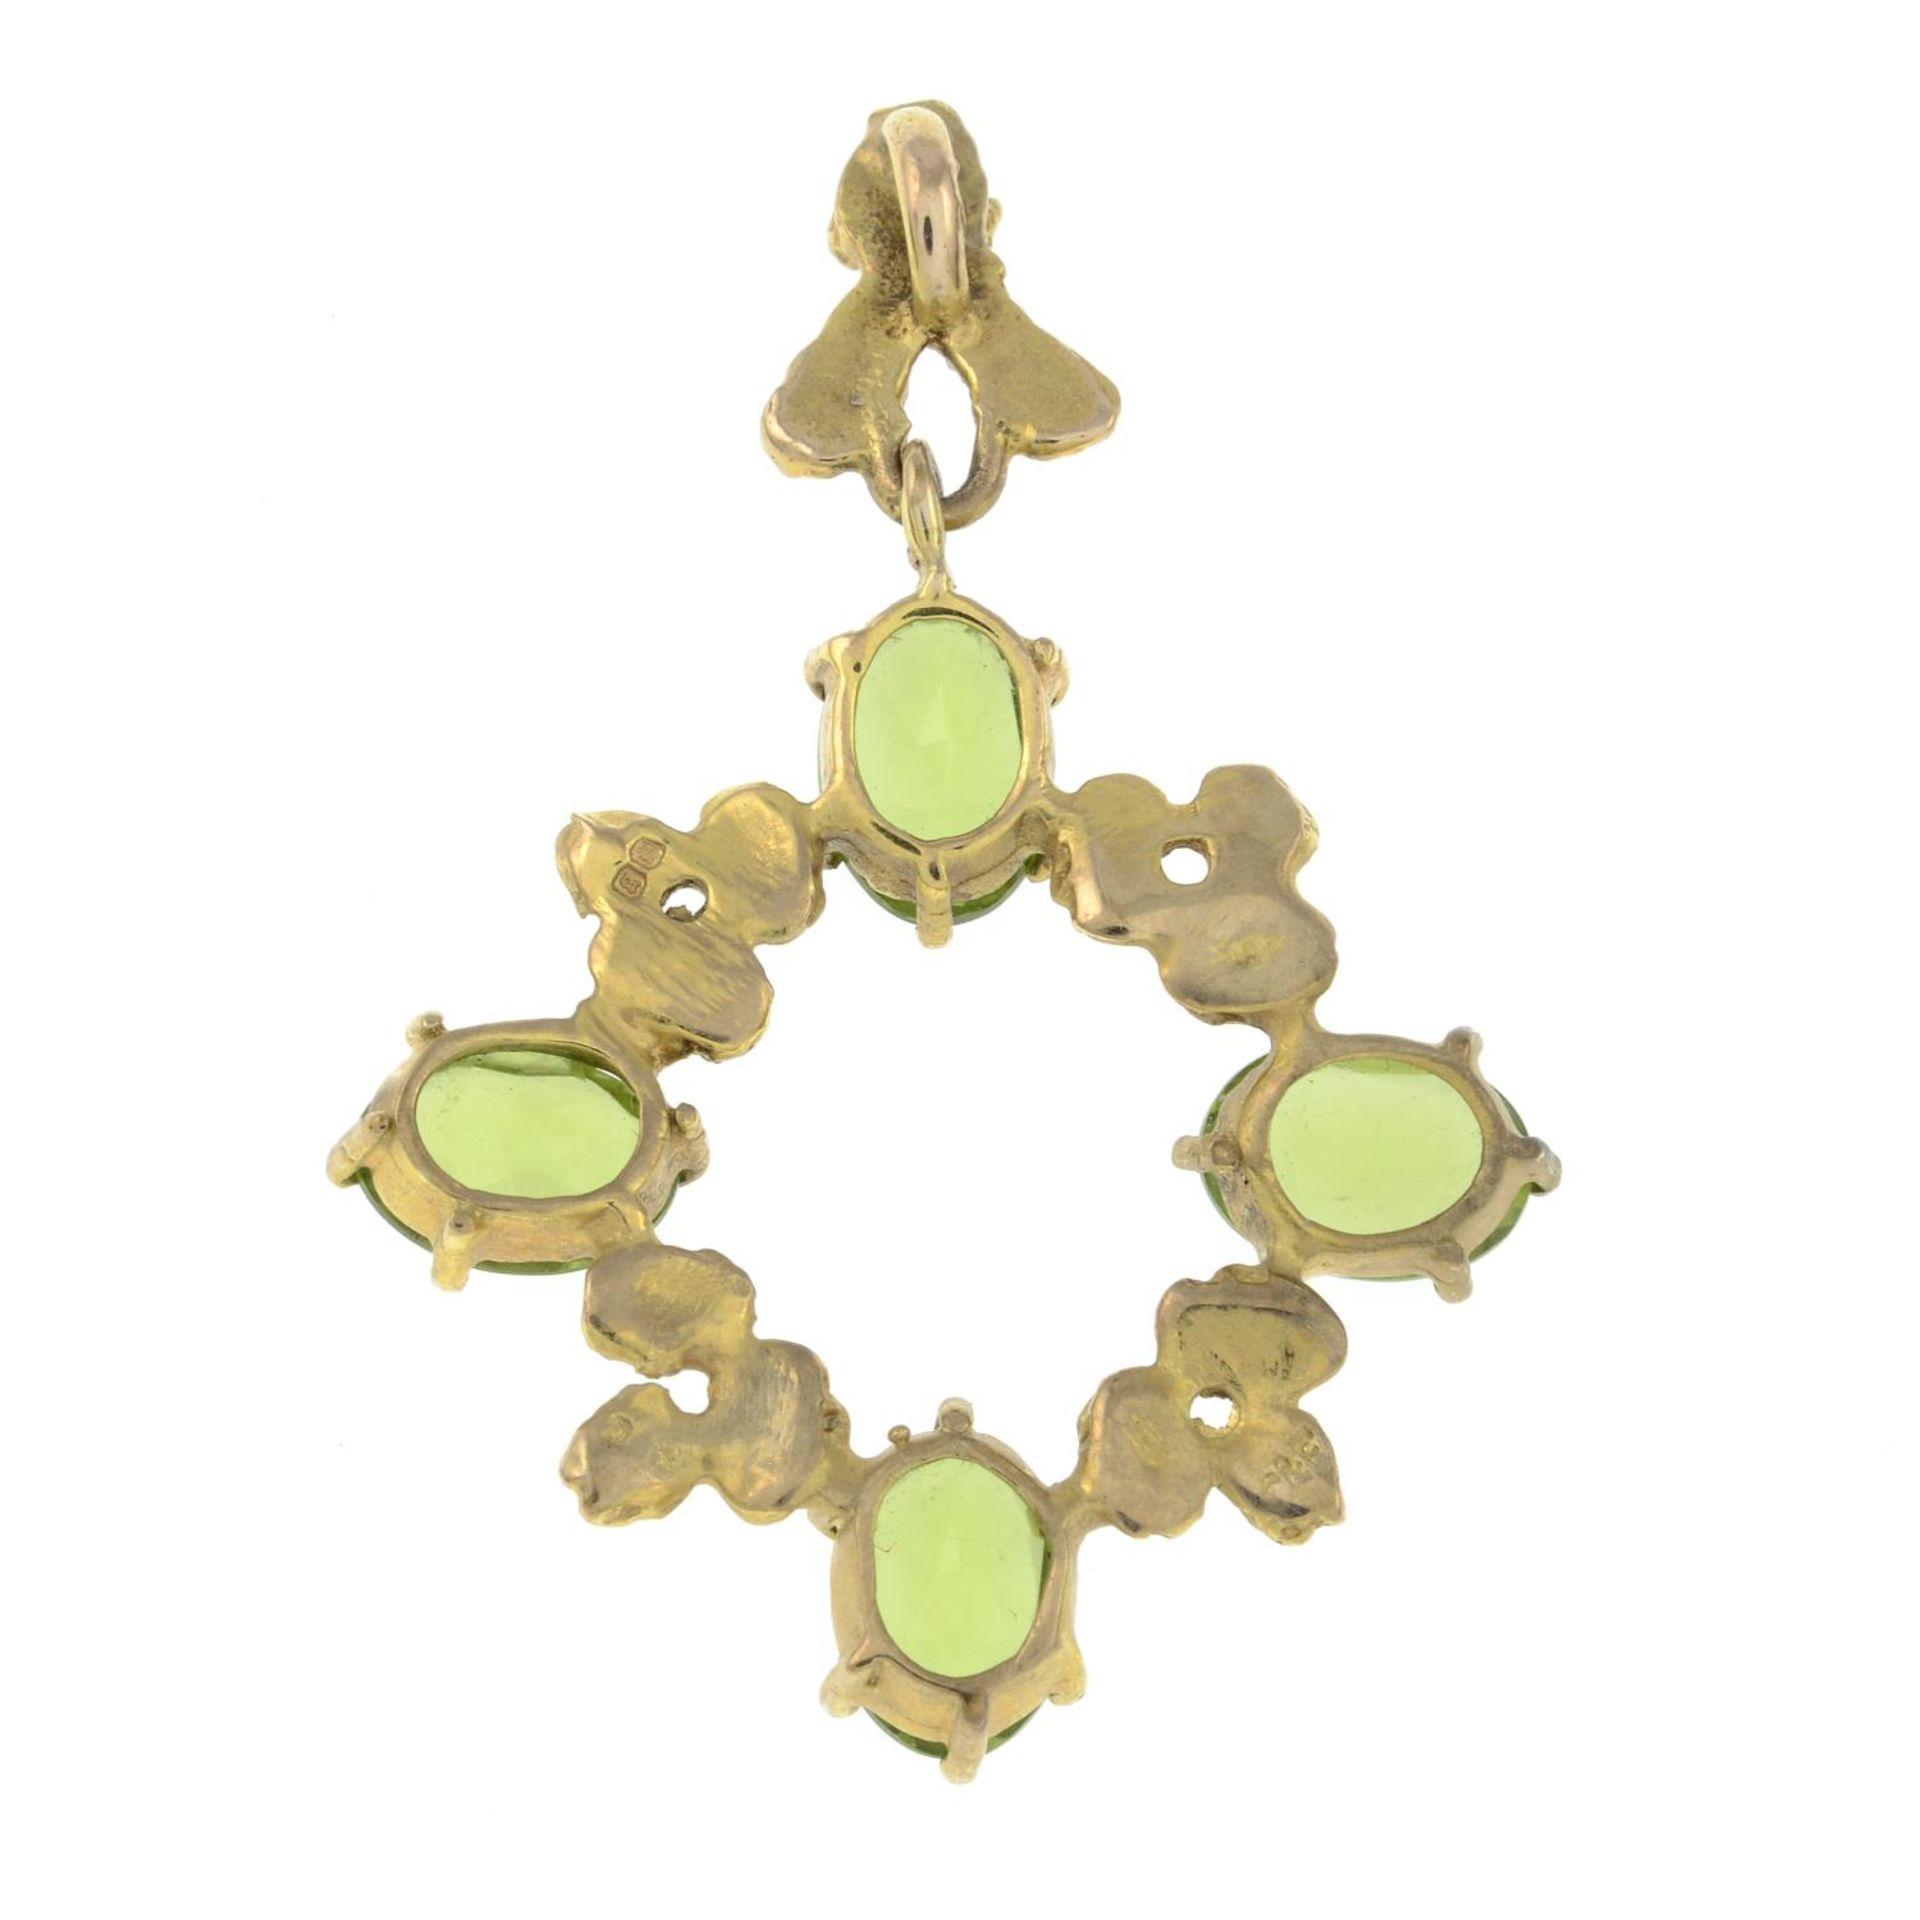 A 1970s 9ct gold peridot pendant, by Cropp & Farr.Hallmarks for London, 1976. - Bild 2 aus 2